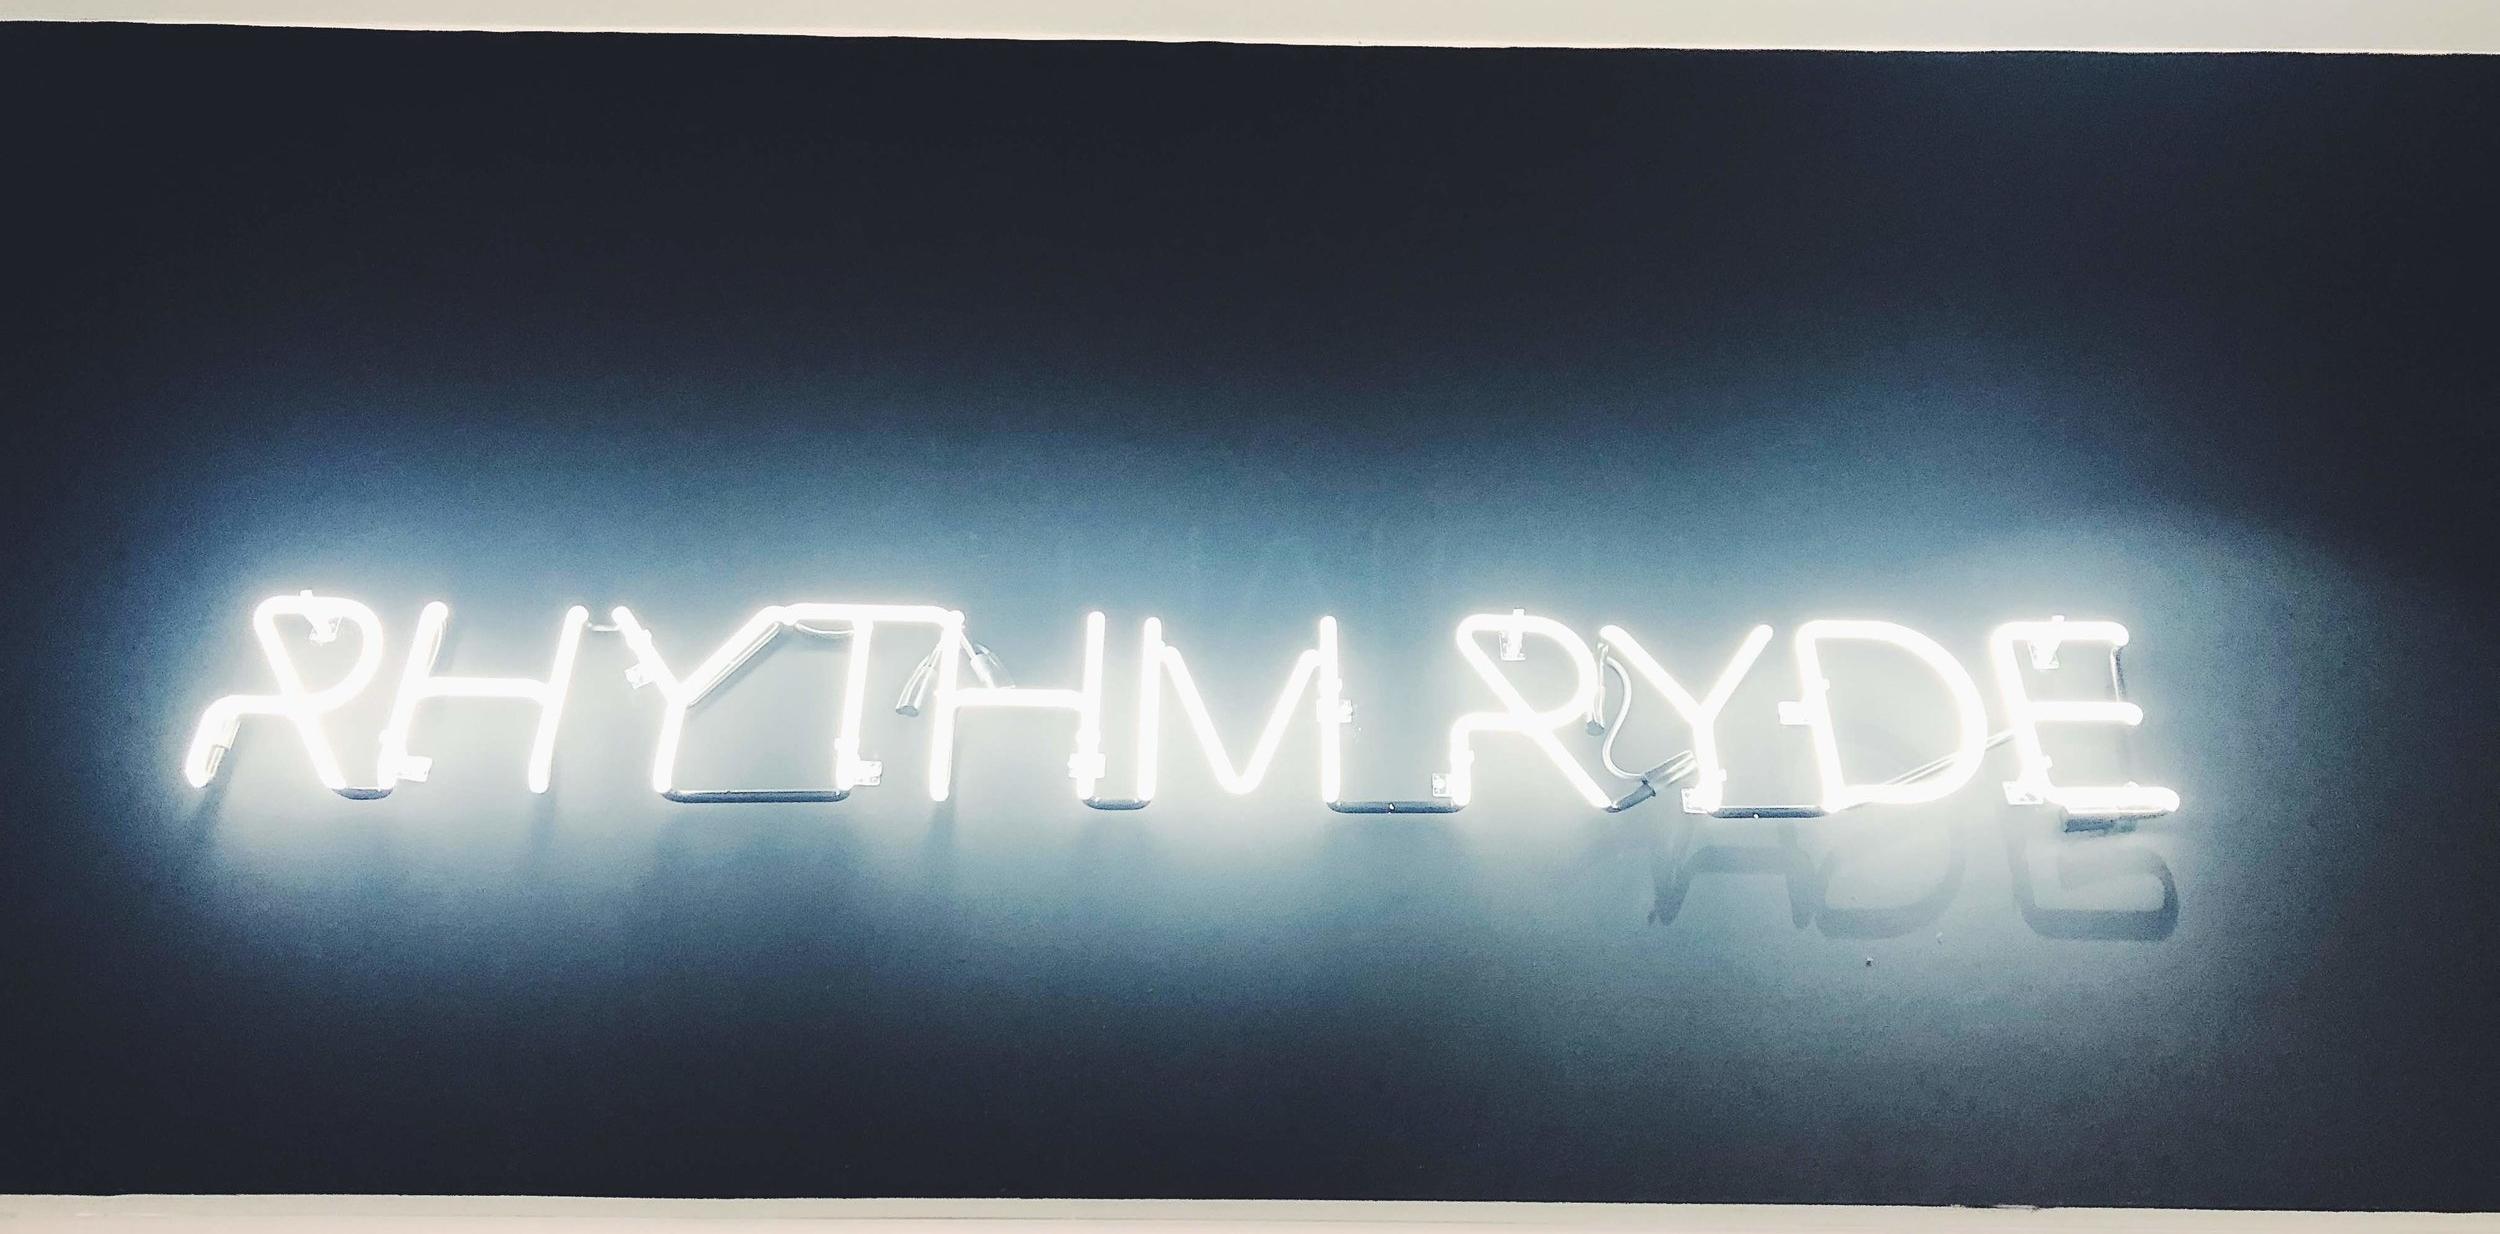 Rhythm Ryde neon sign in dumbo.